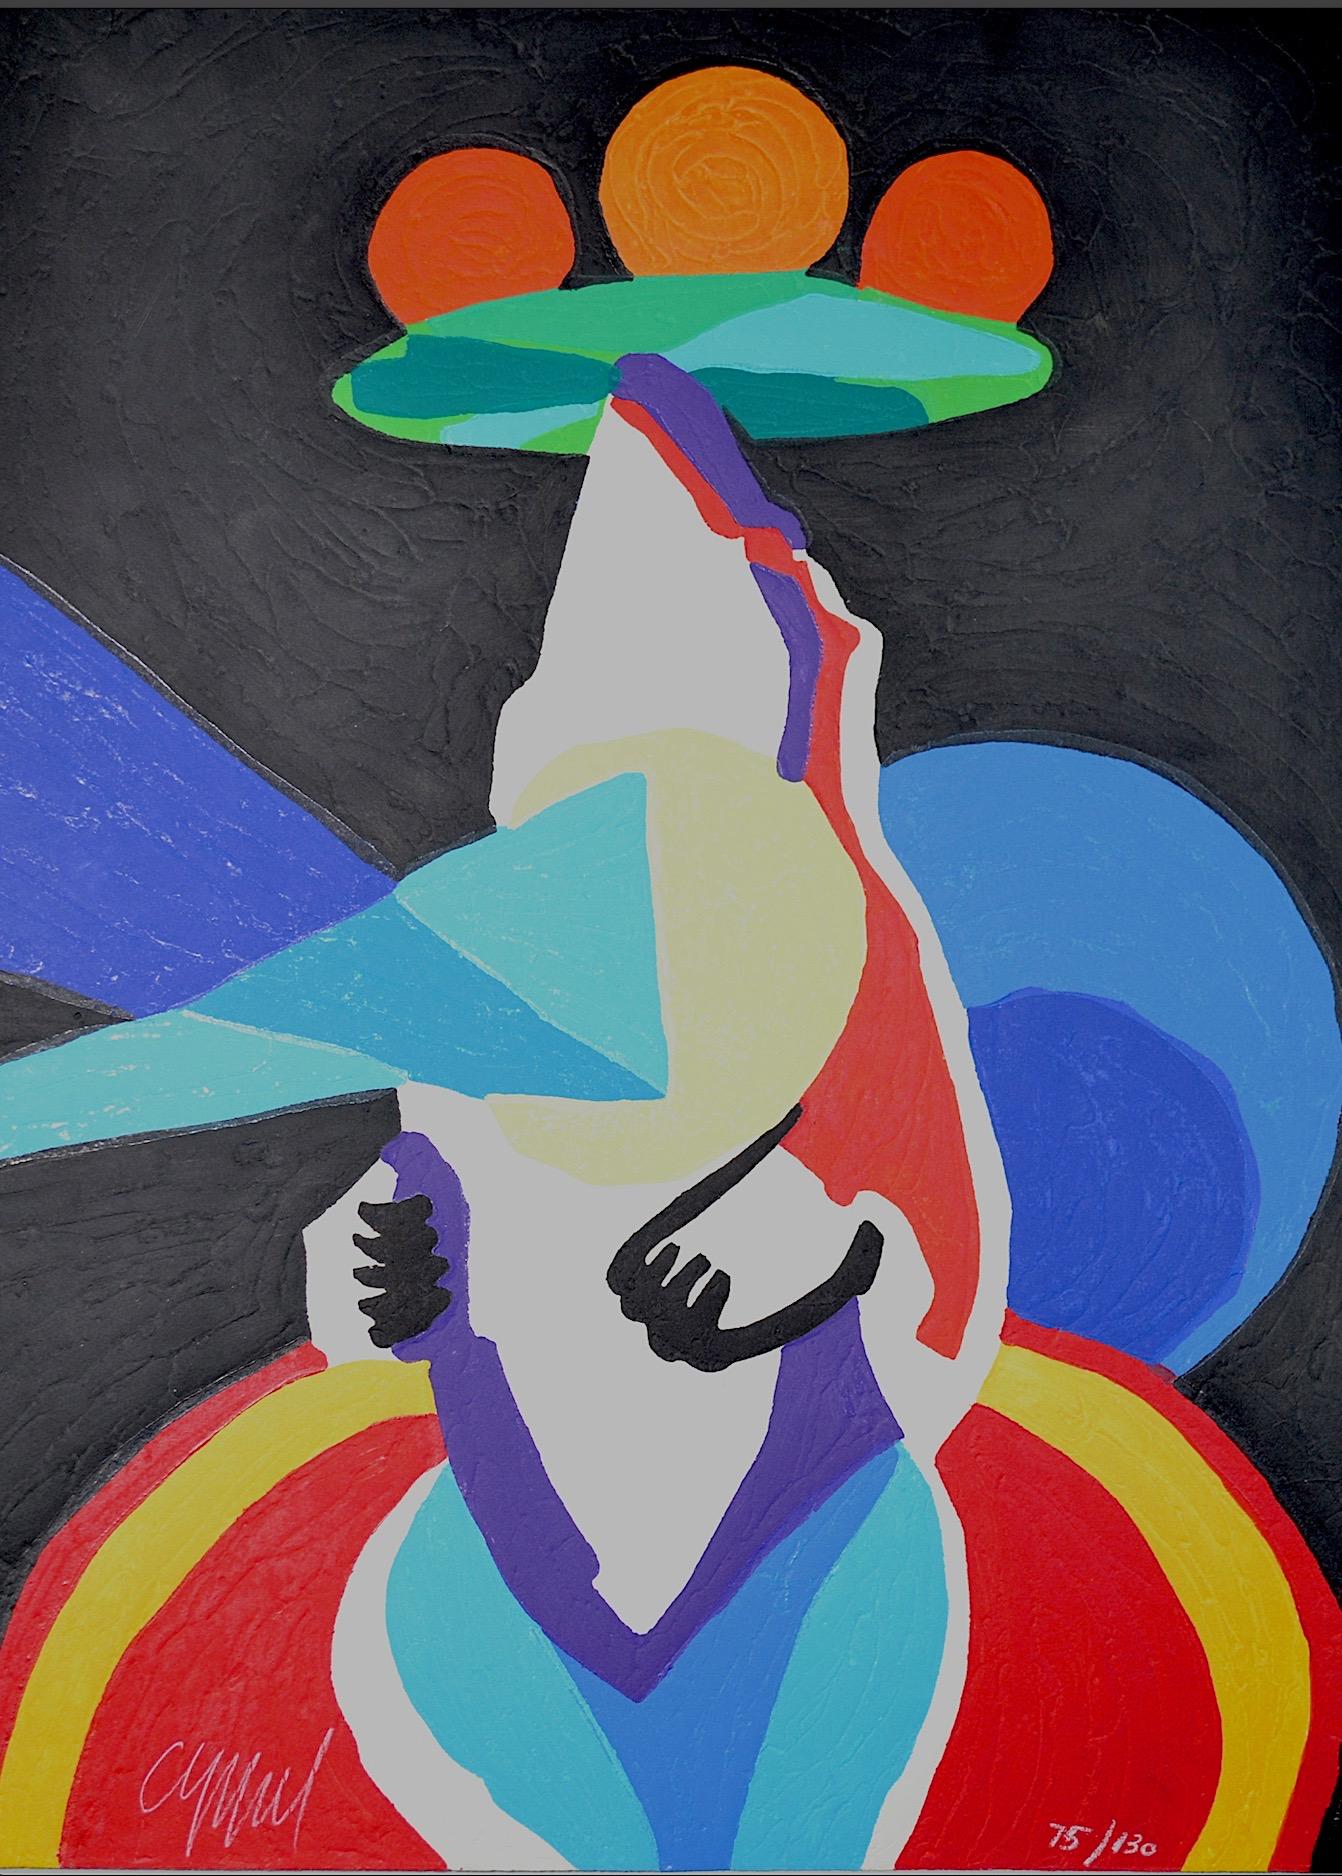 Circus Suite, No. 29 by Karel Appel